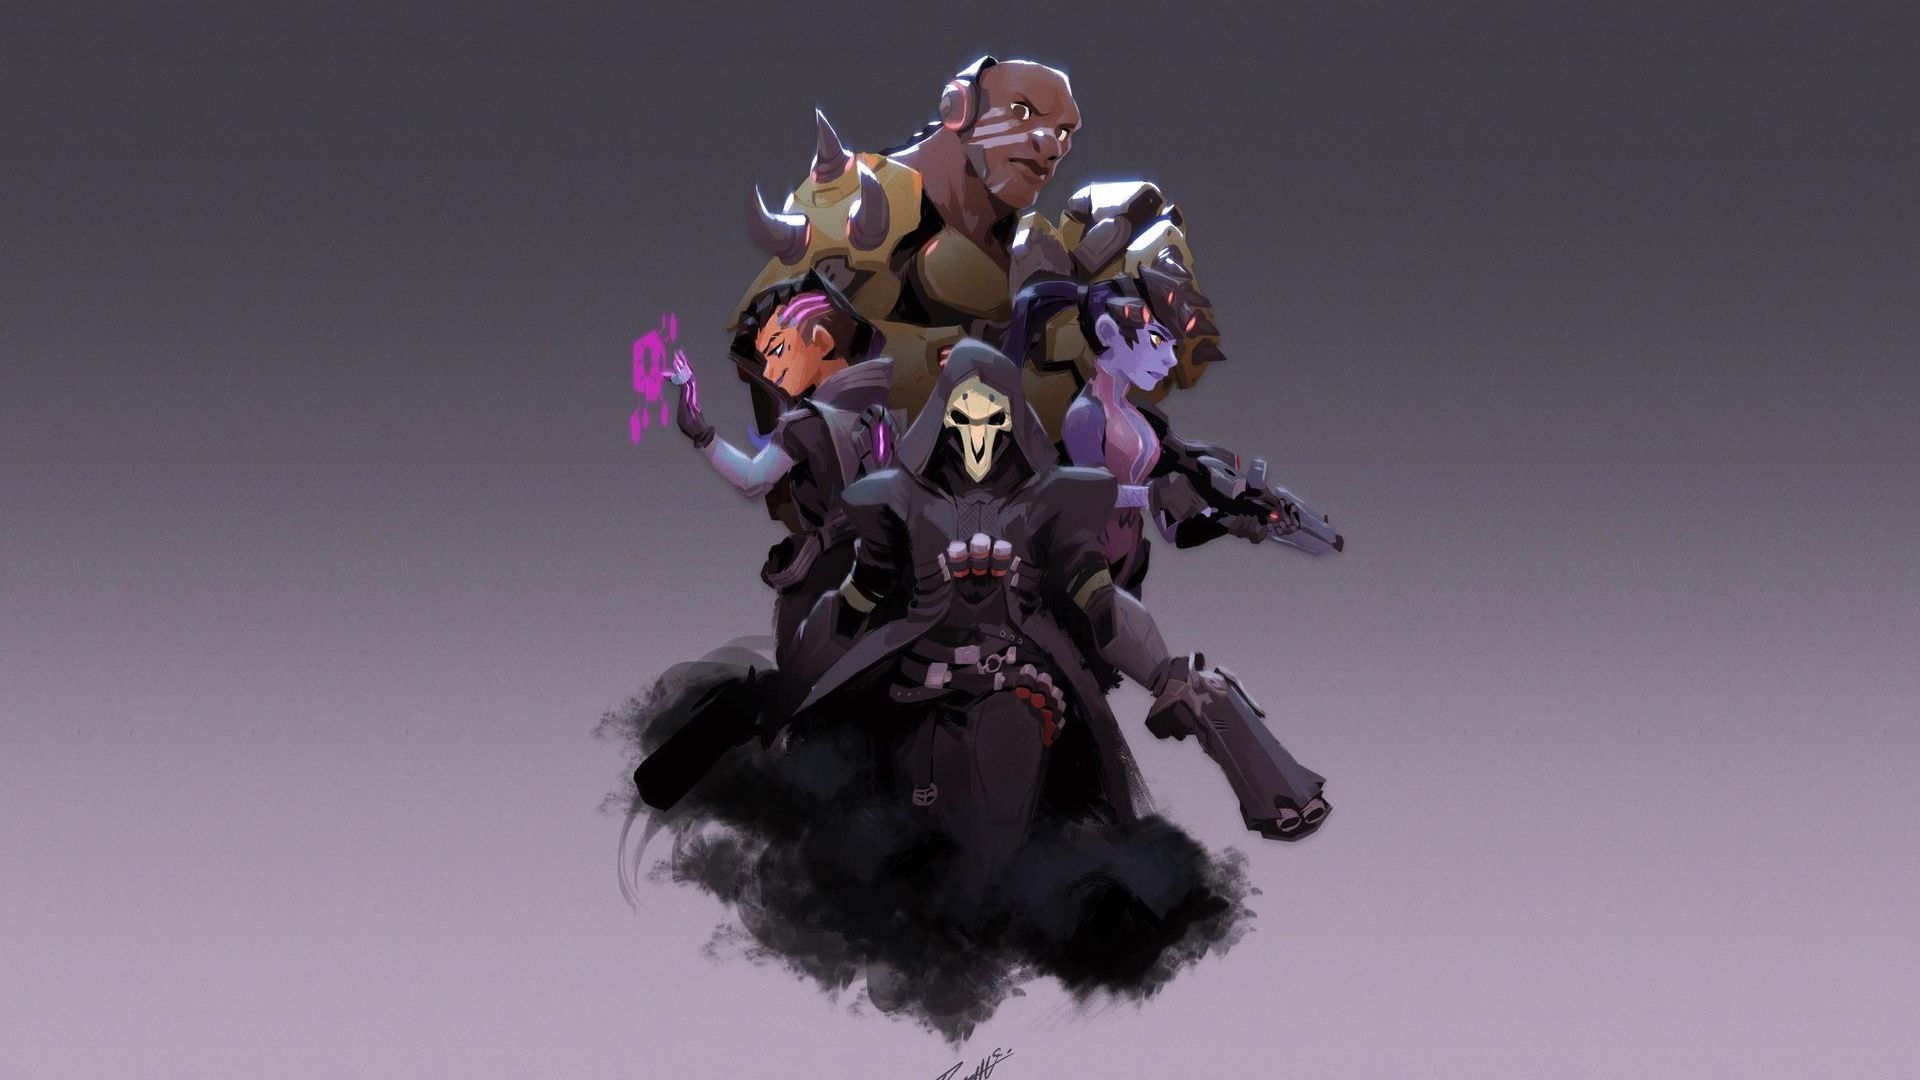 Desktop wallpaper overwatch reaper widowmaker art - Overwatch christmas wallpaper ...